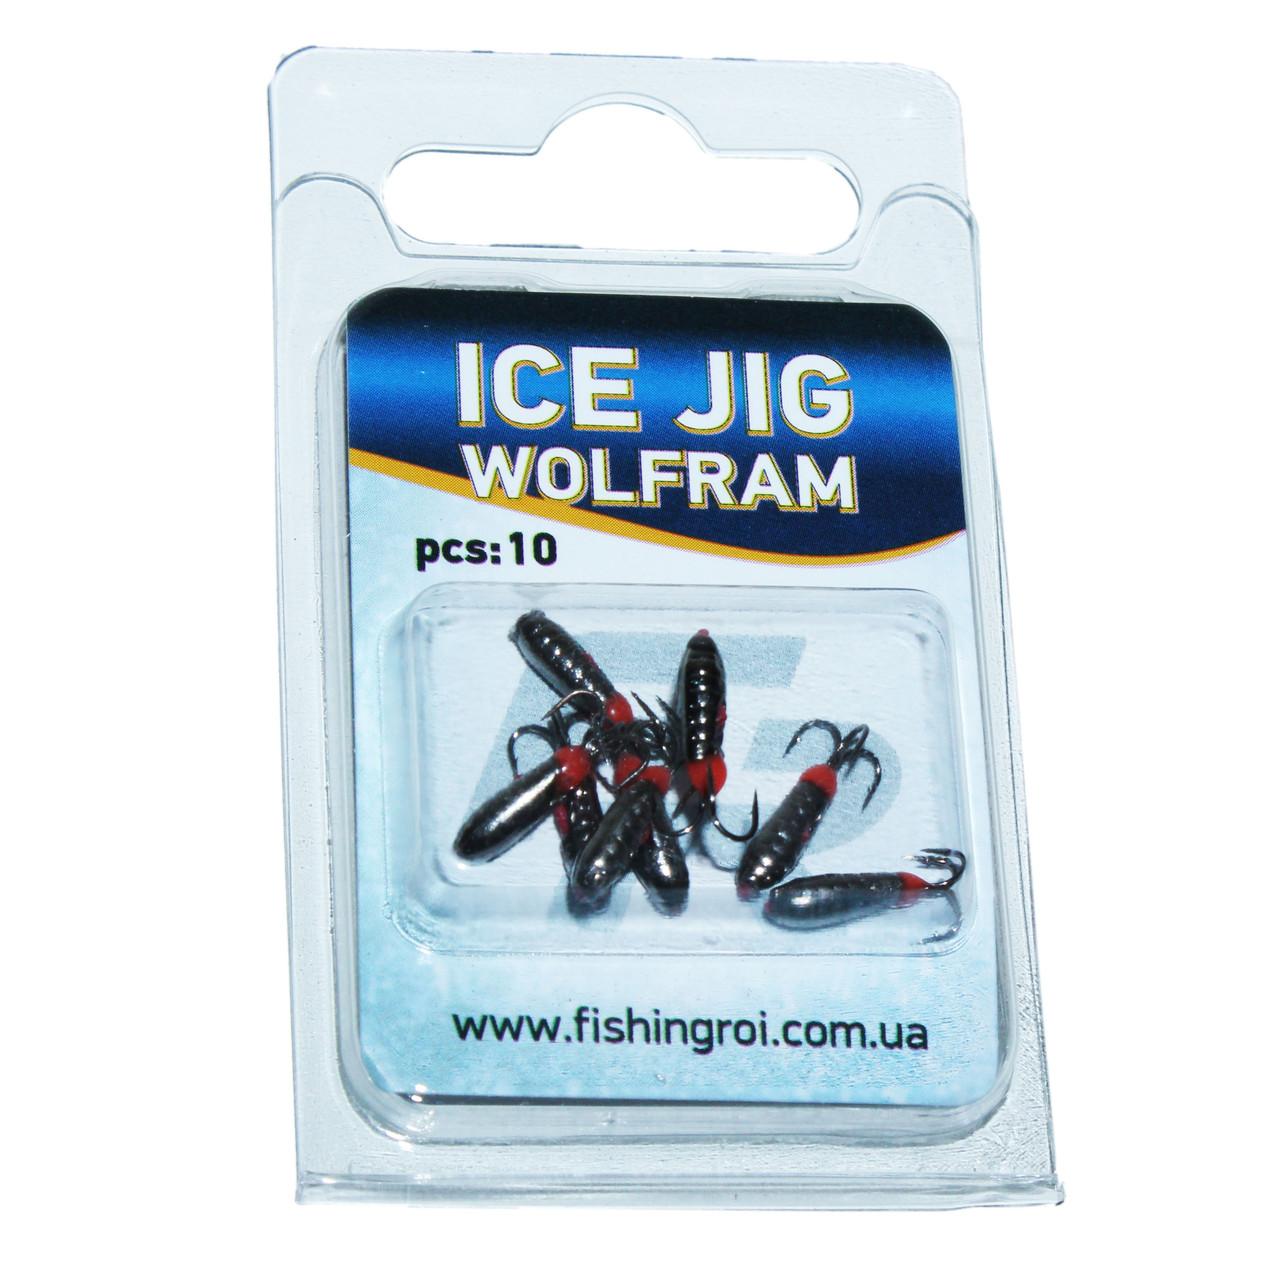 Мормышка вольфрамовая чортик Fishing ROI Ice Jig 0.55 г., 2.9 мм.